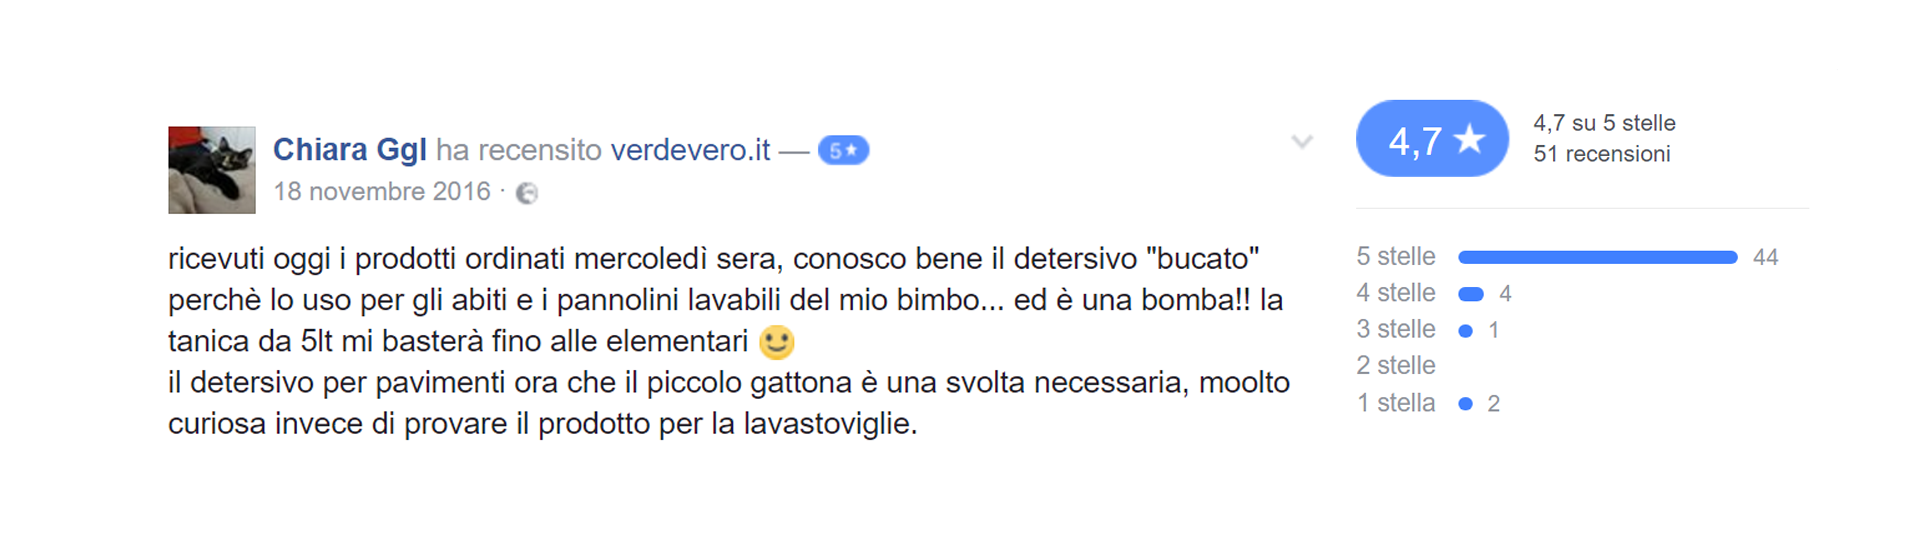 recensione verdevero facebook